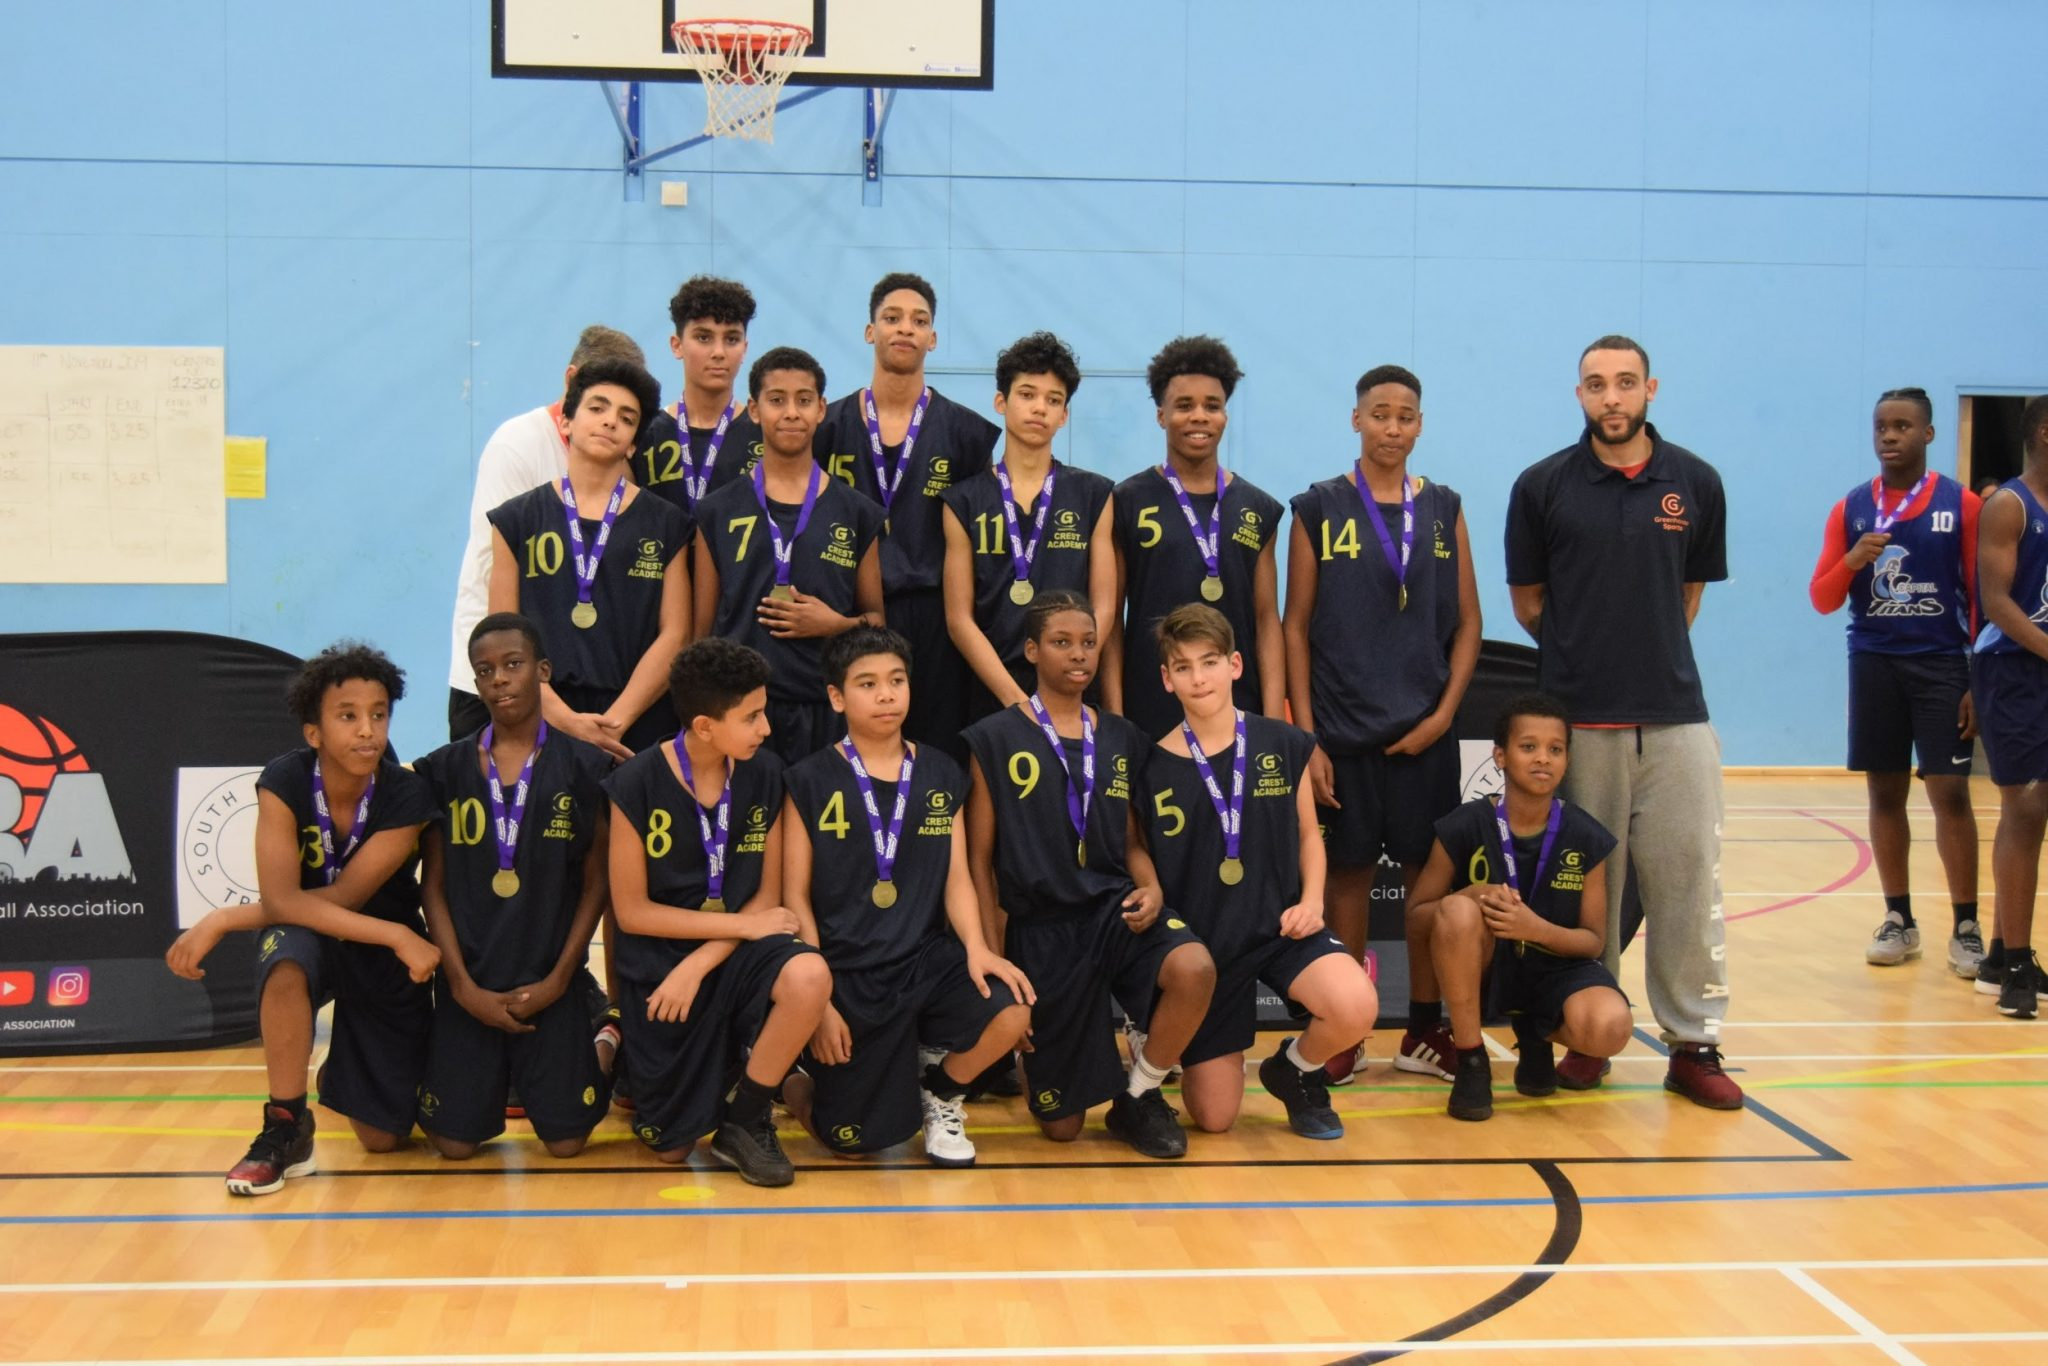 Brent U14 Boys Champions: Crest Academy